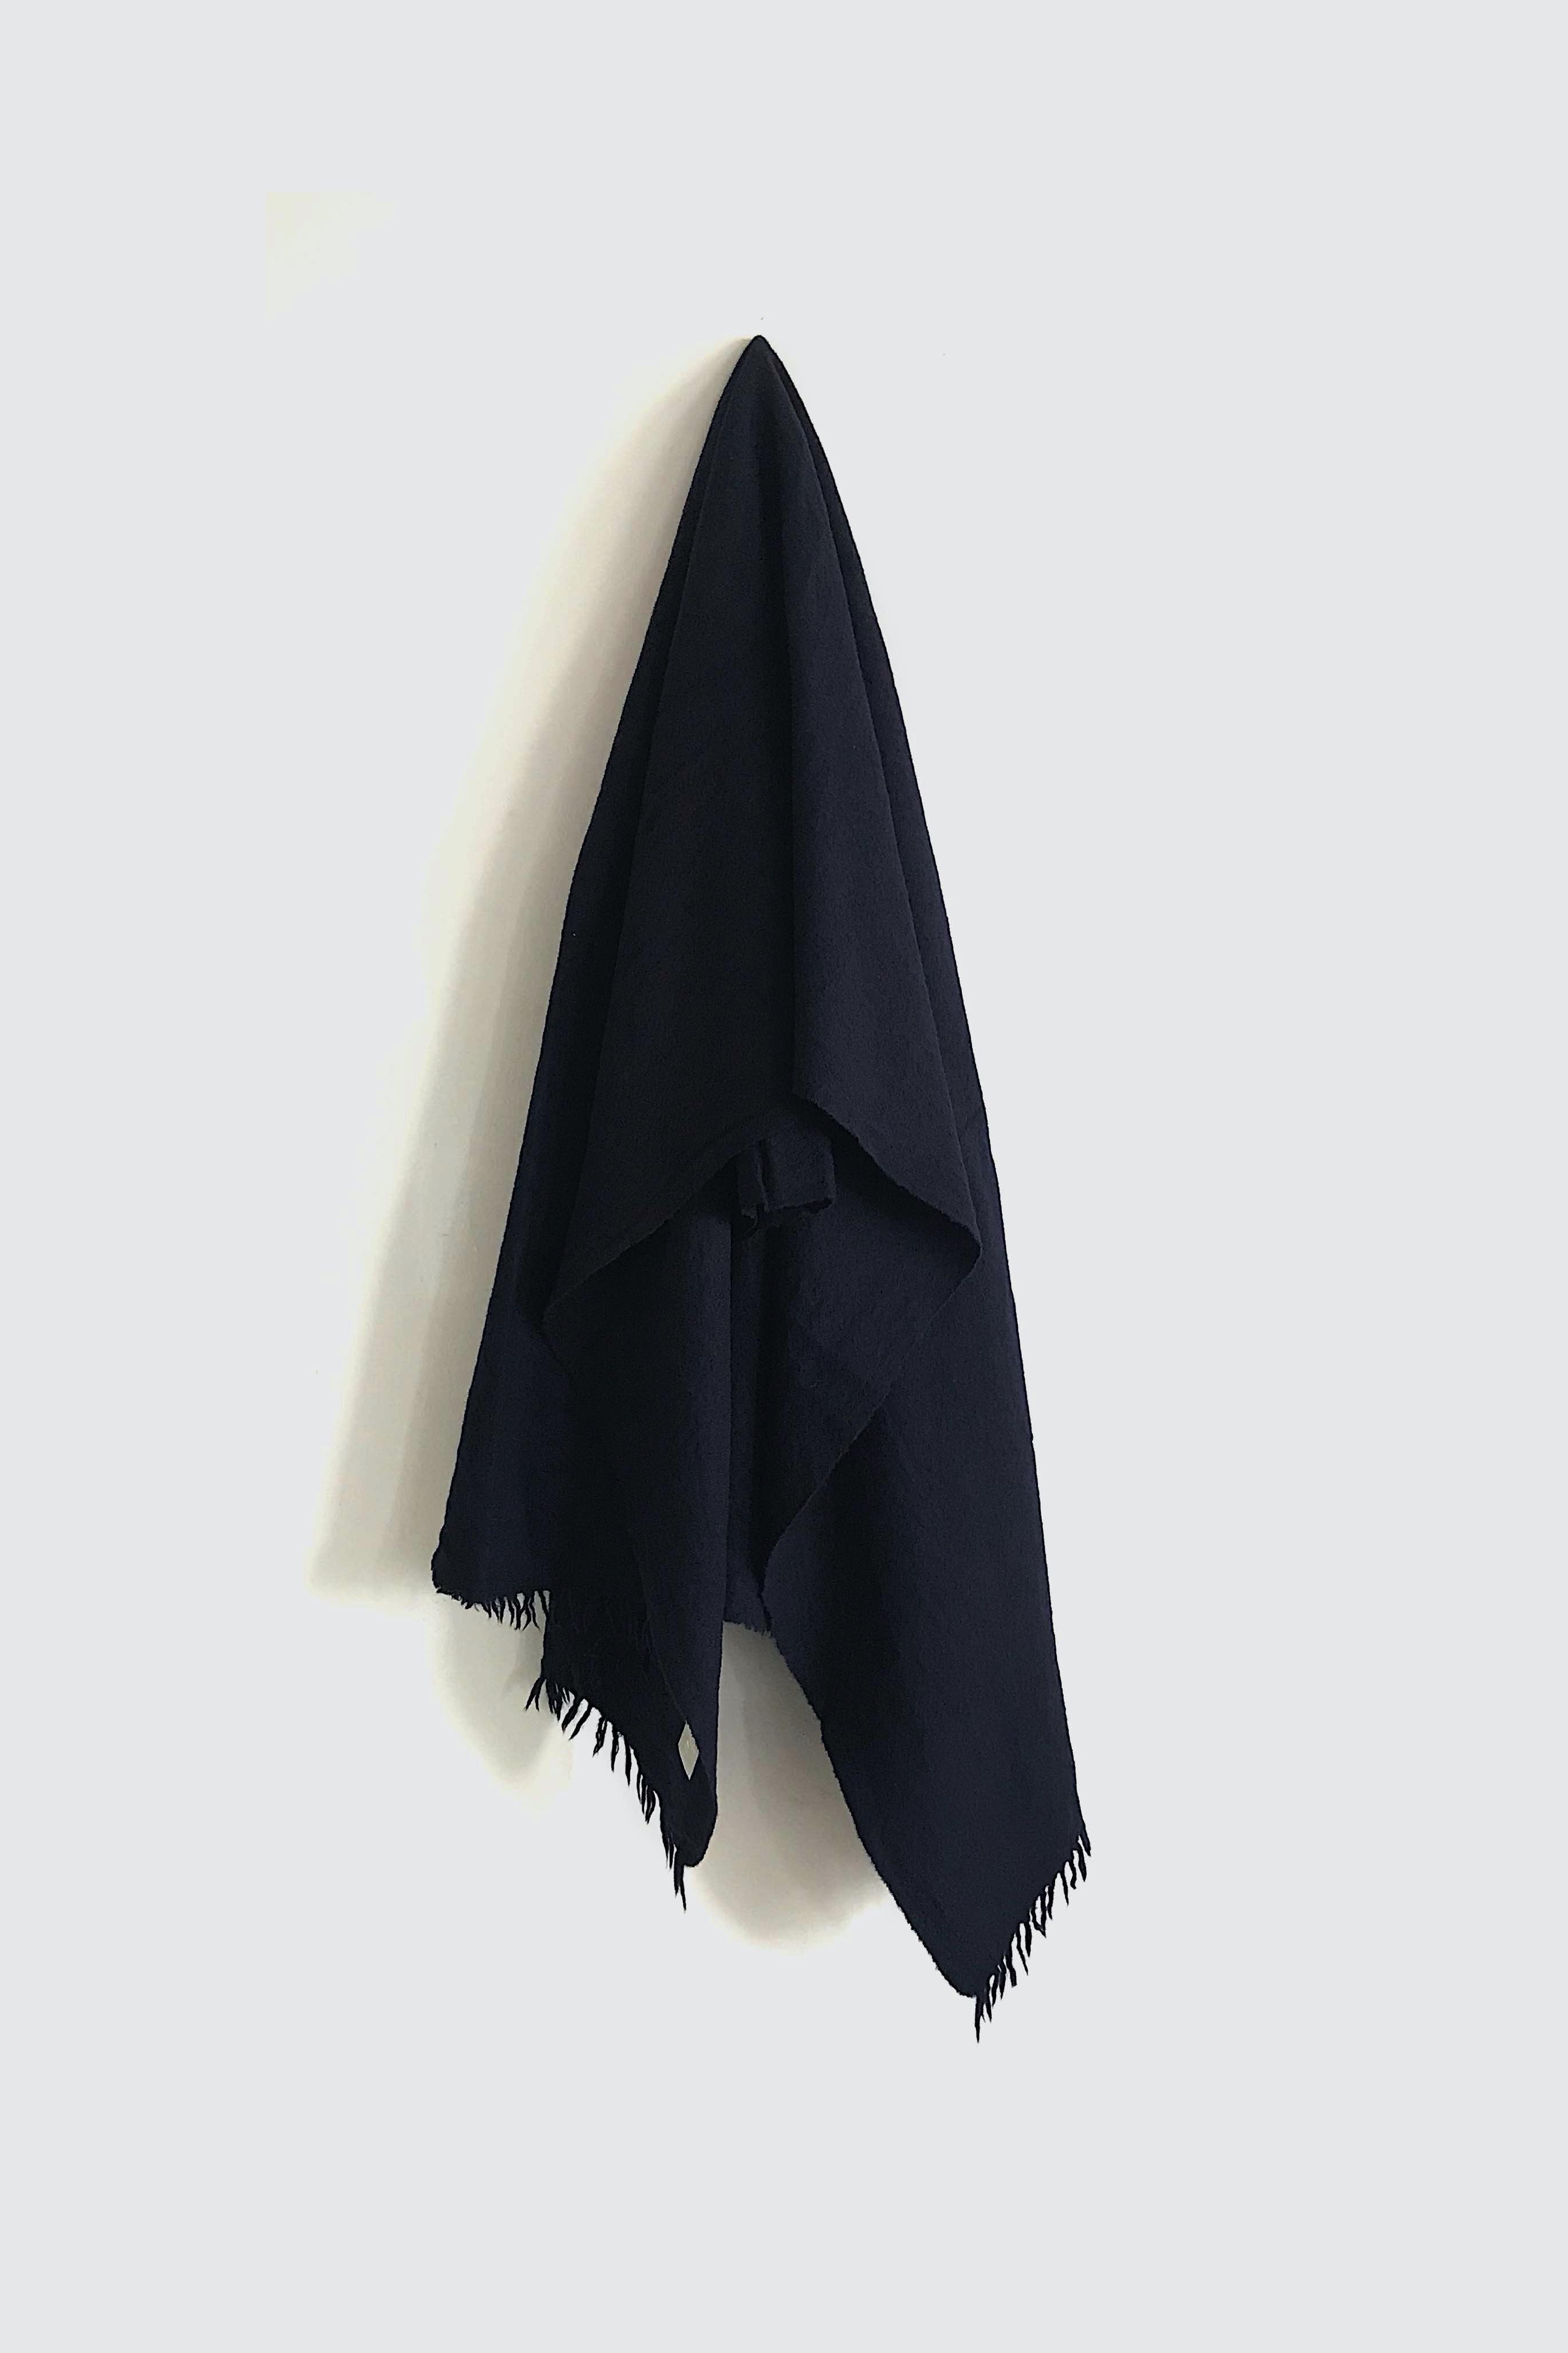 01471-4 muji stole / navy